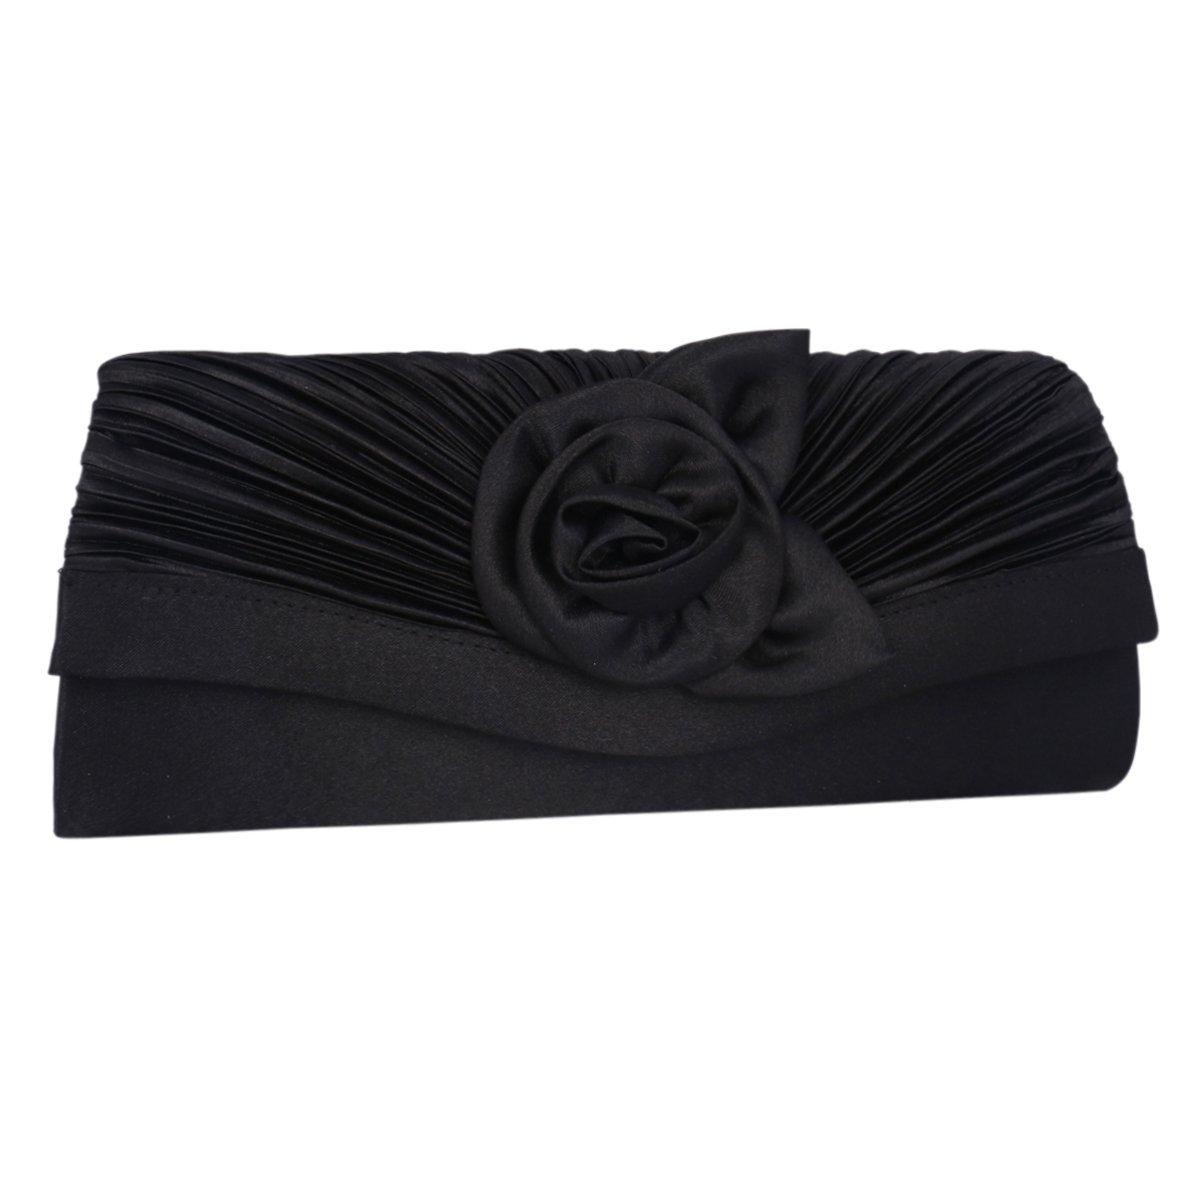 Adoptfade Womens Pleated Flower Evening Clutch Satin Vintage Dinner Bag,Black